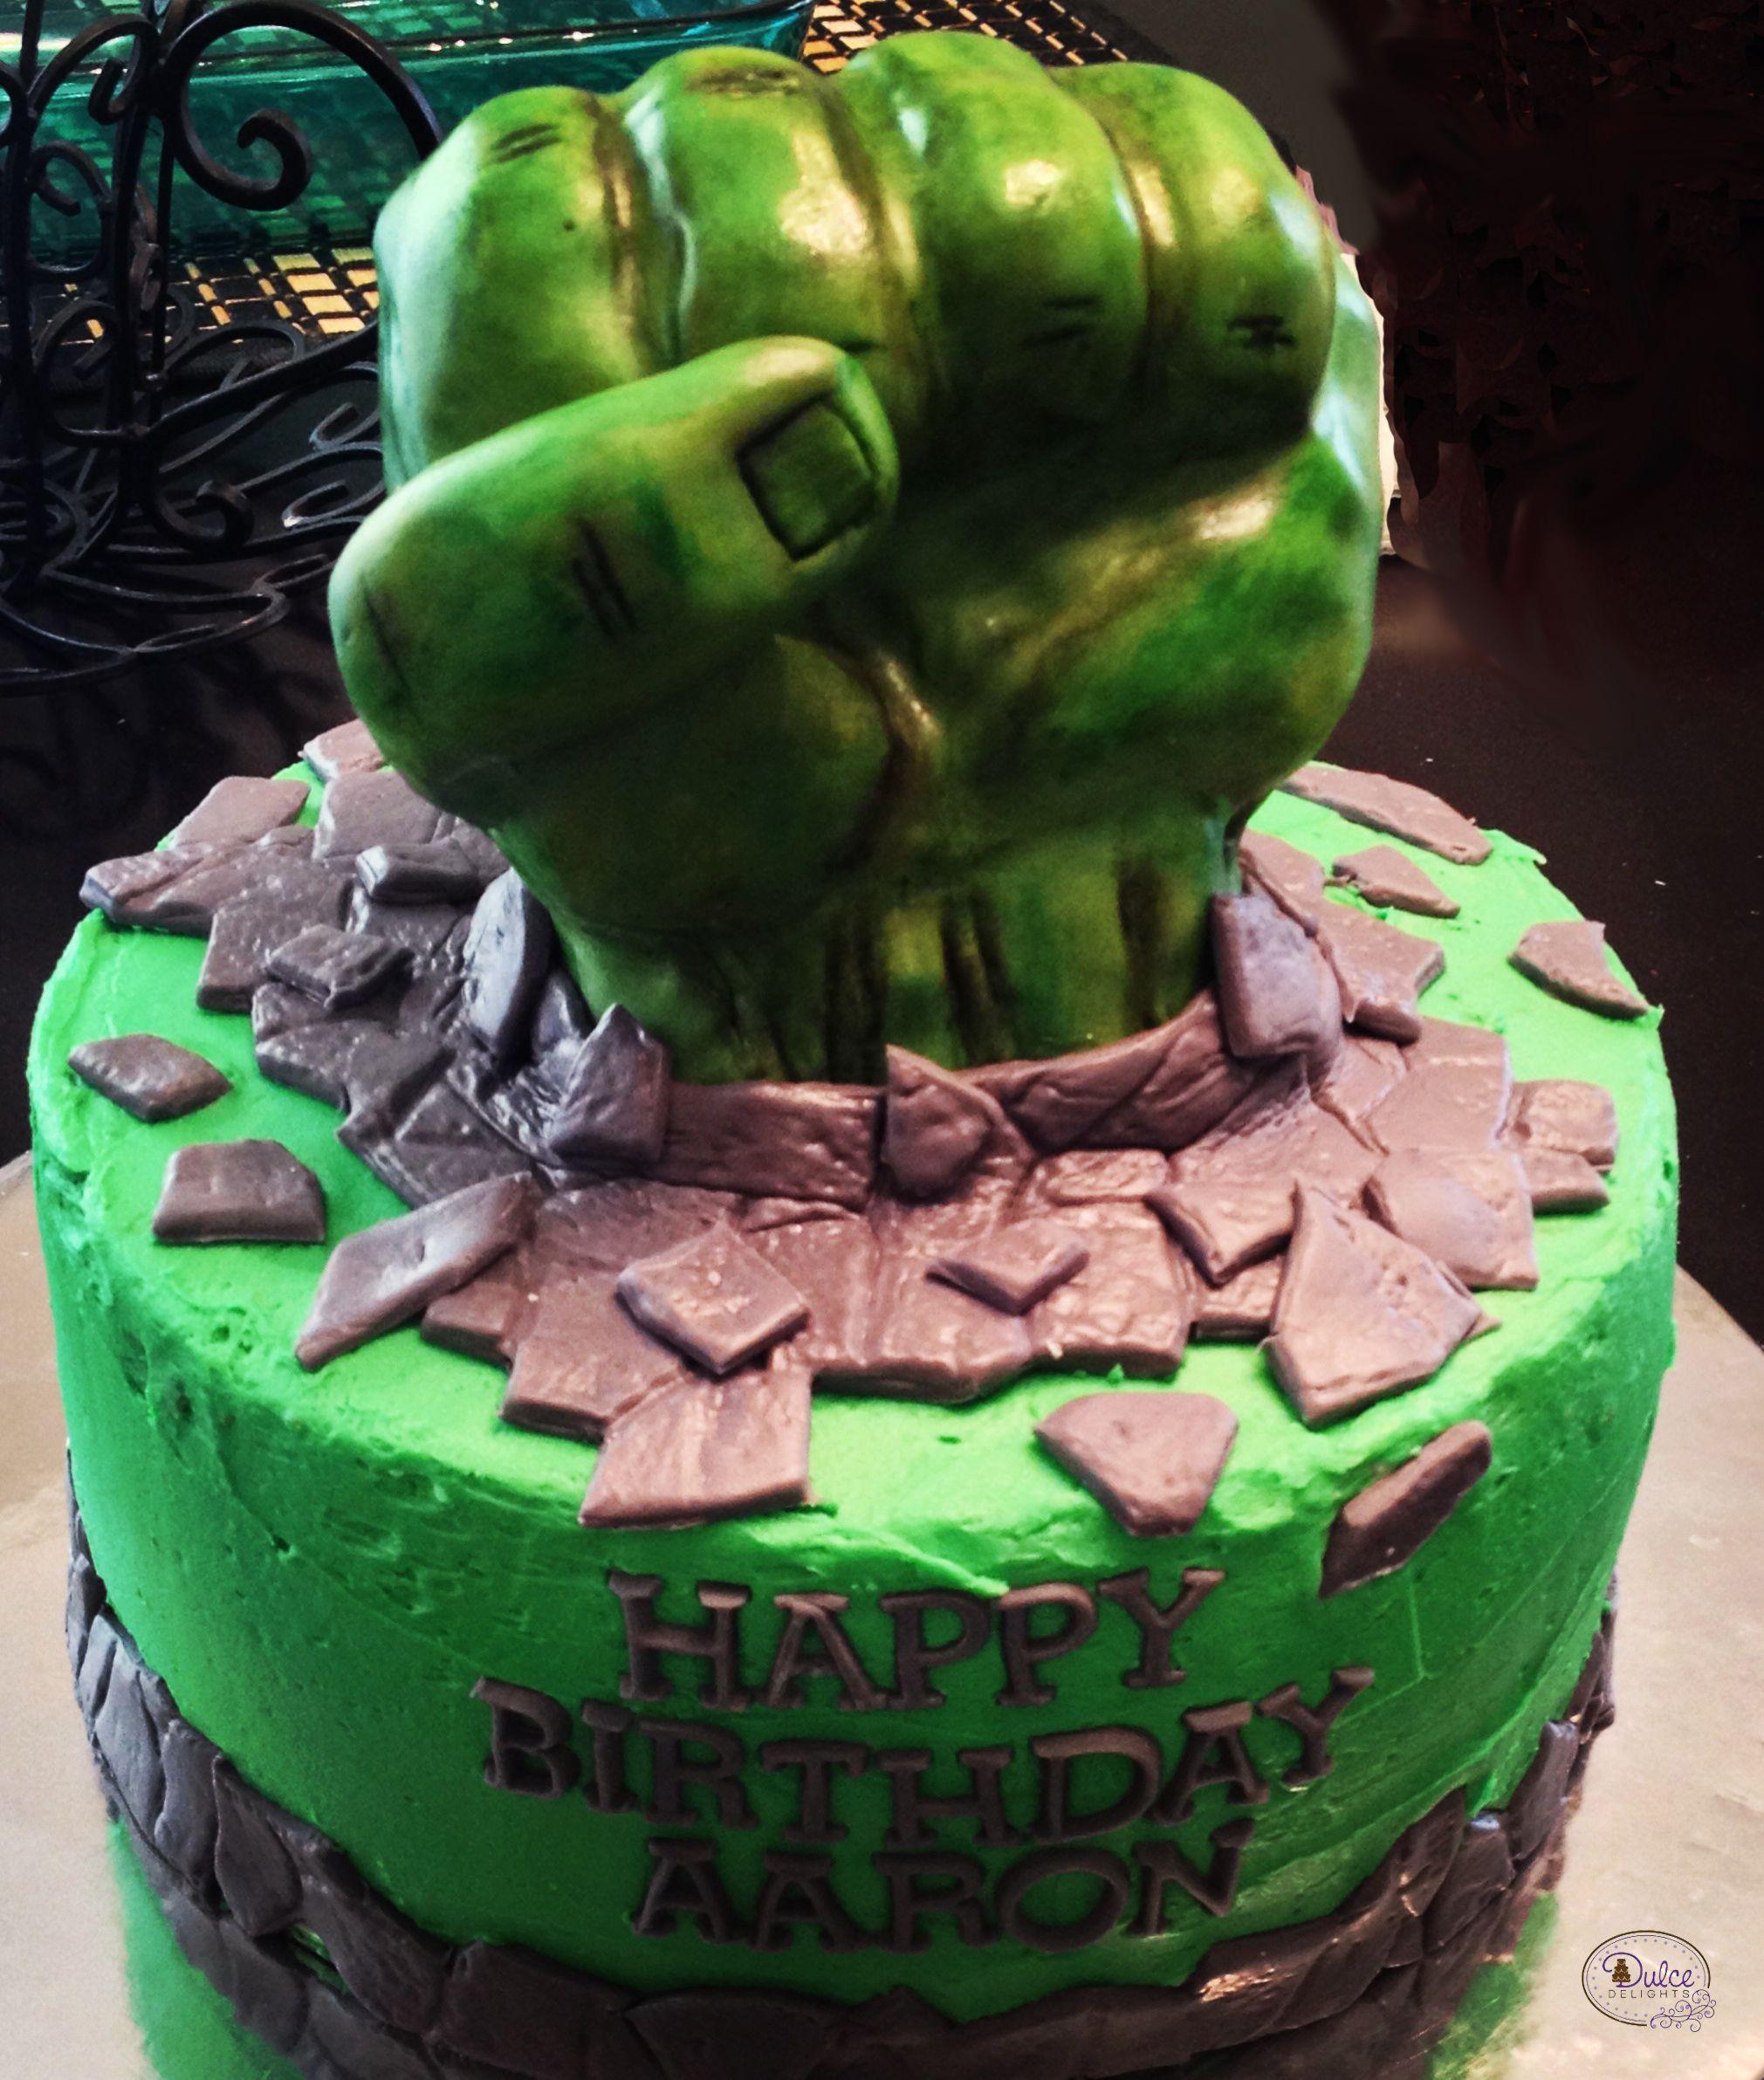 Hulk smash birthday cake Dulce Delights Cakes Pinterest Hulk